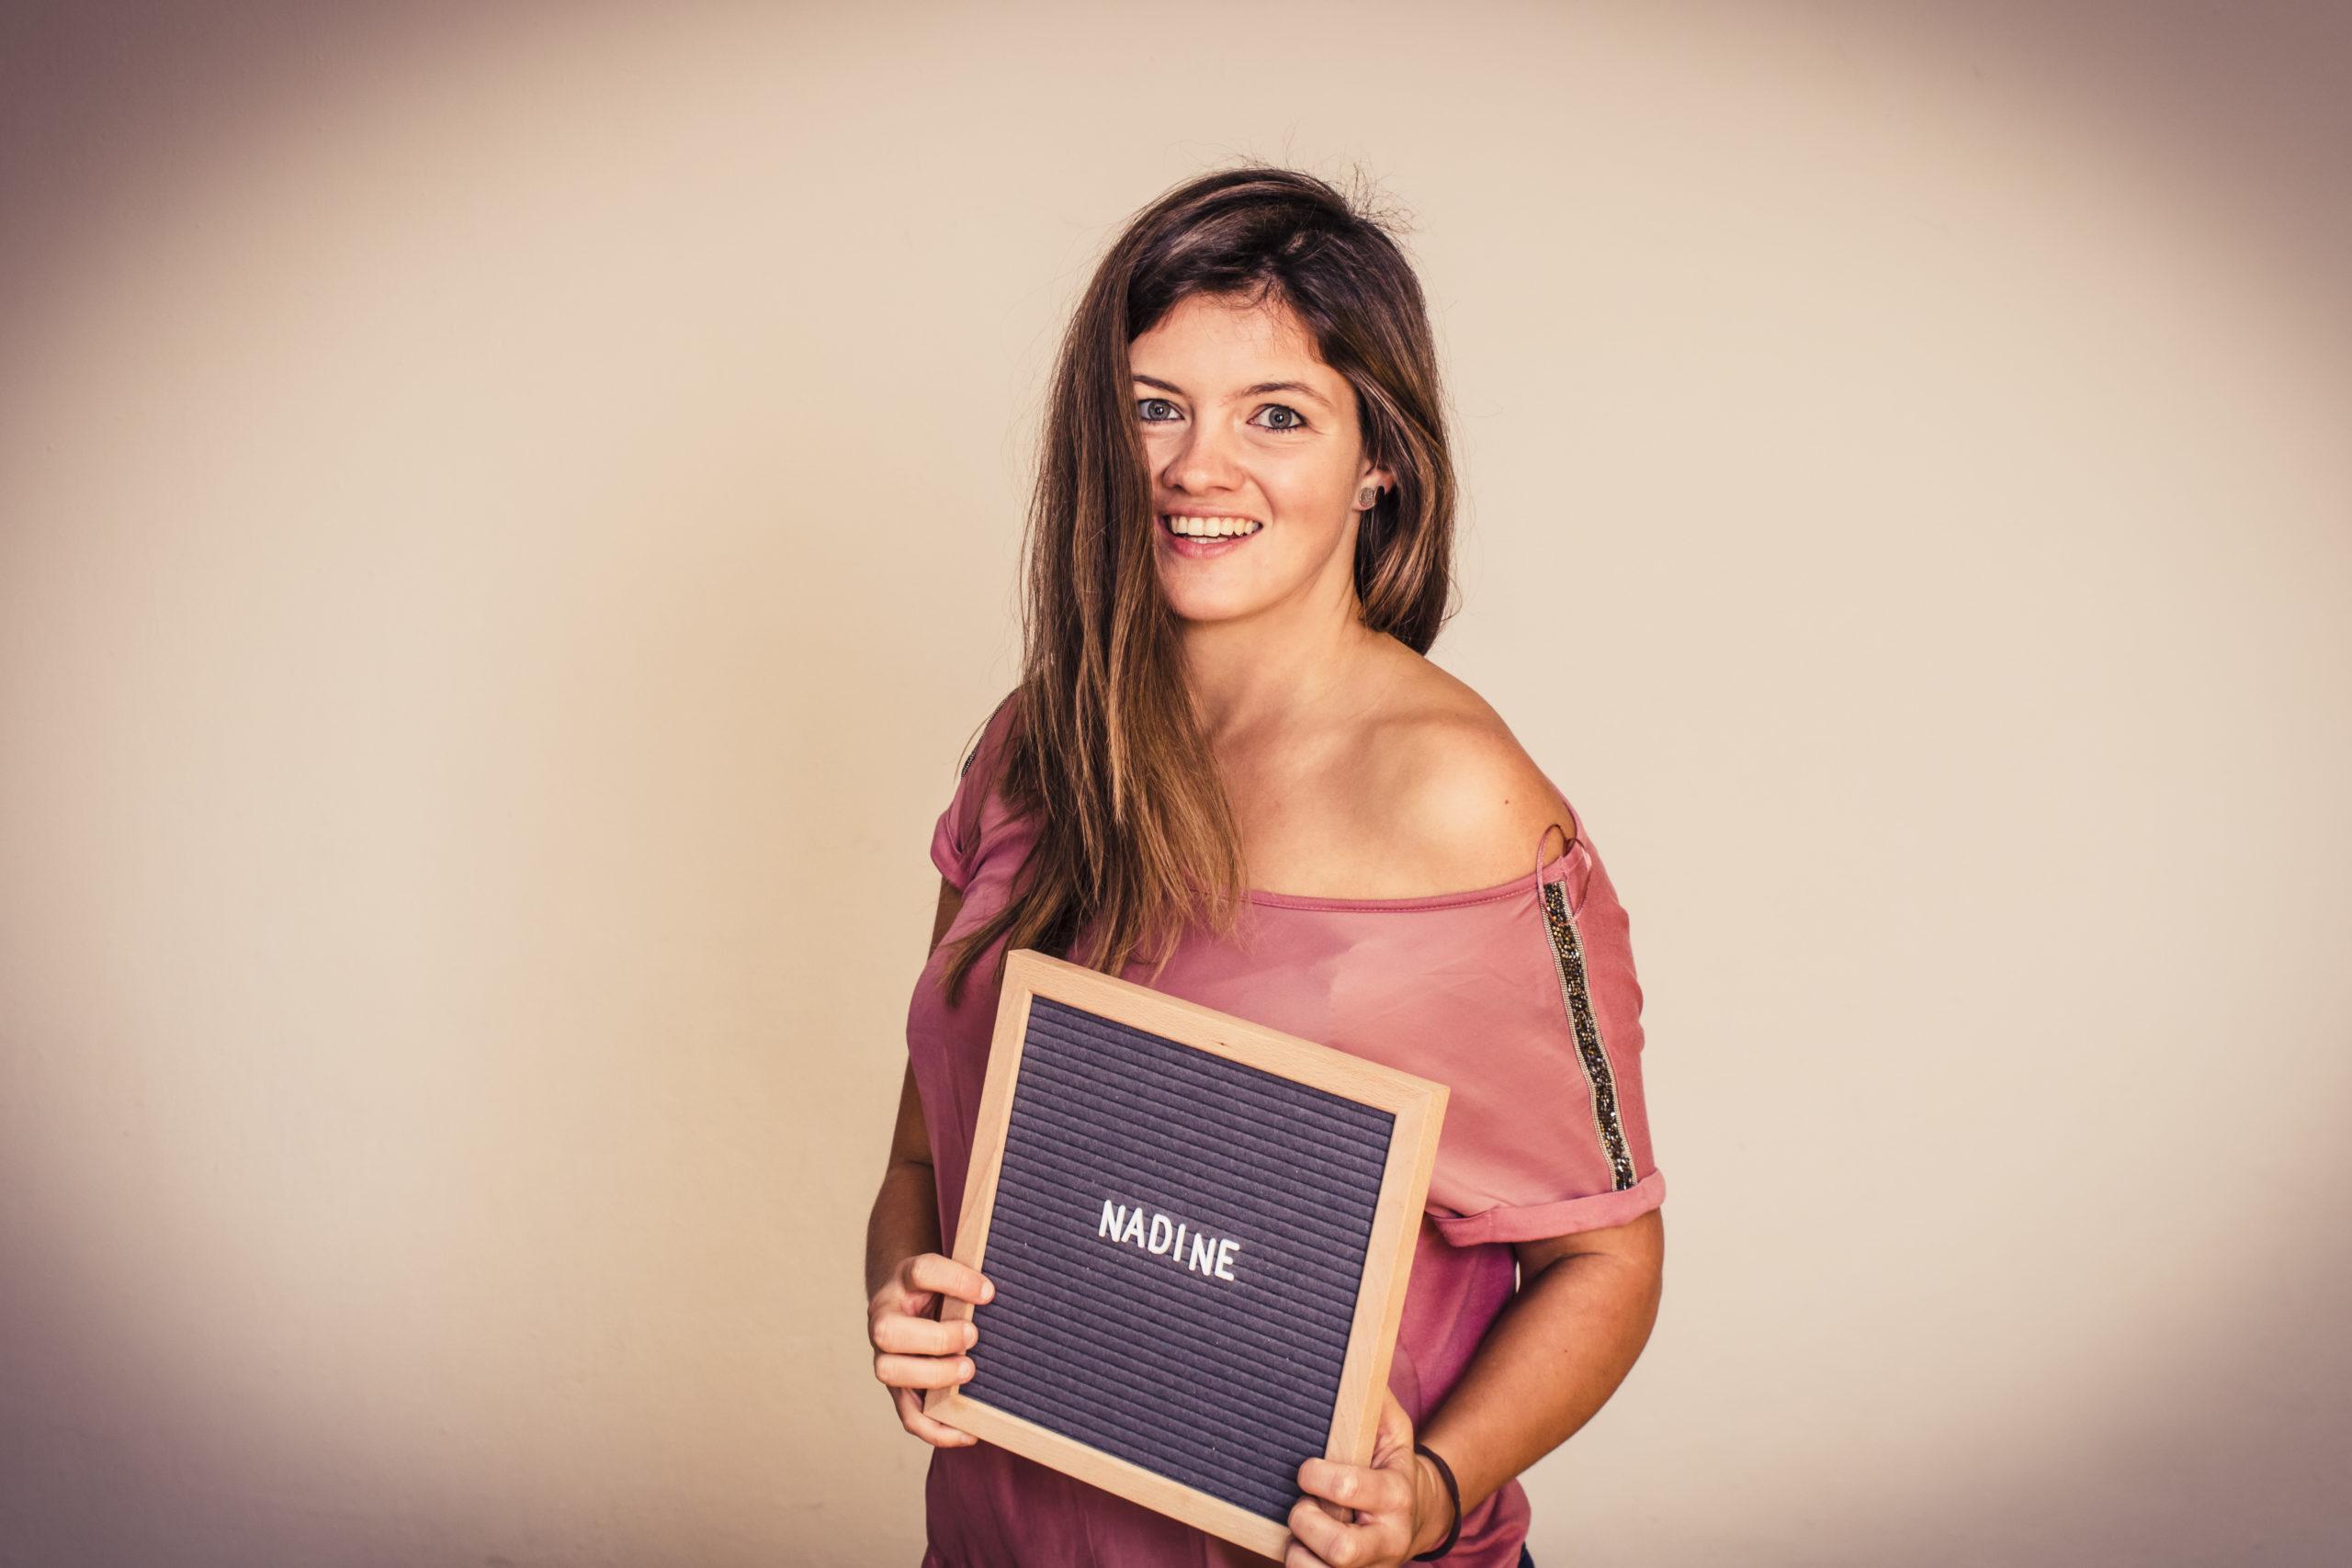 Nadine Body, Mind Health Bundle